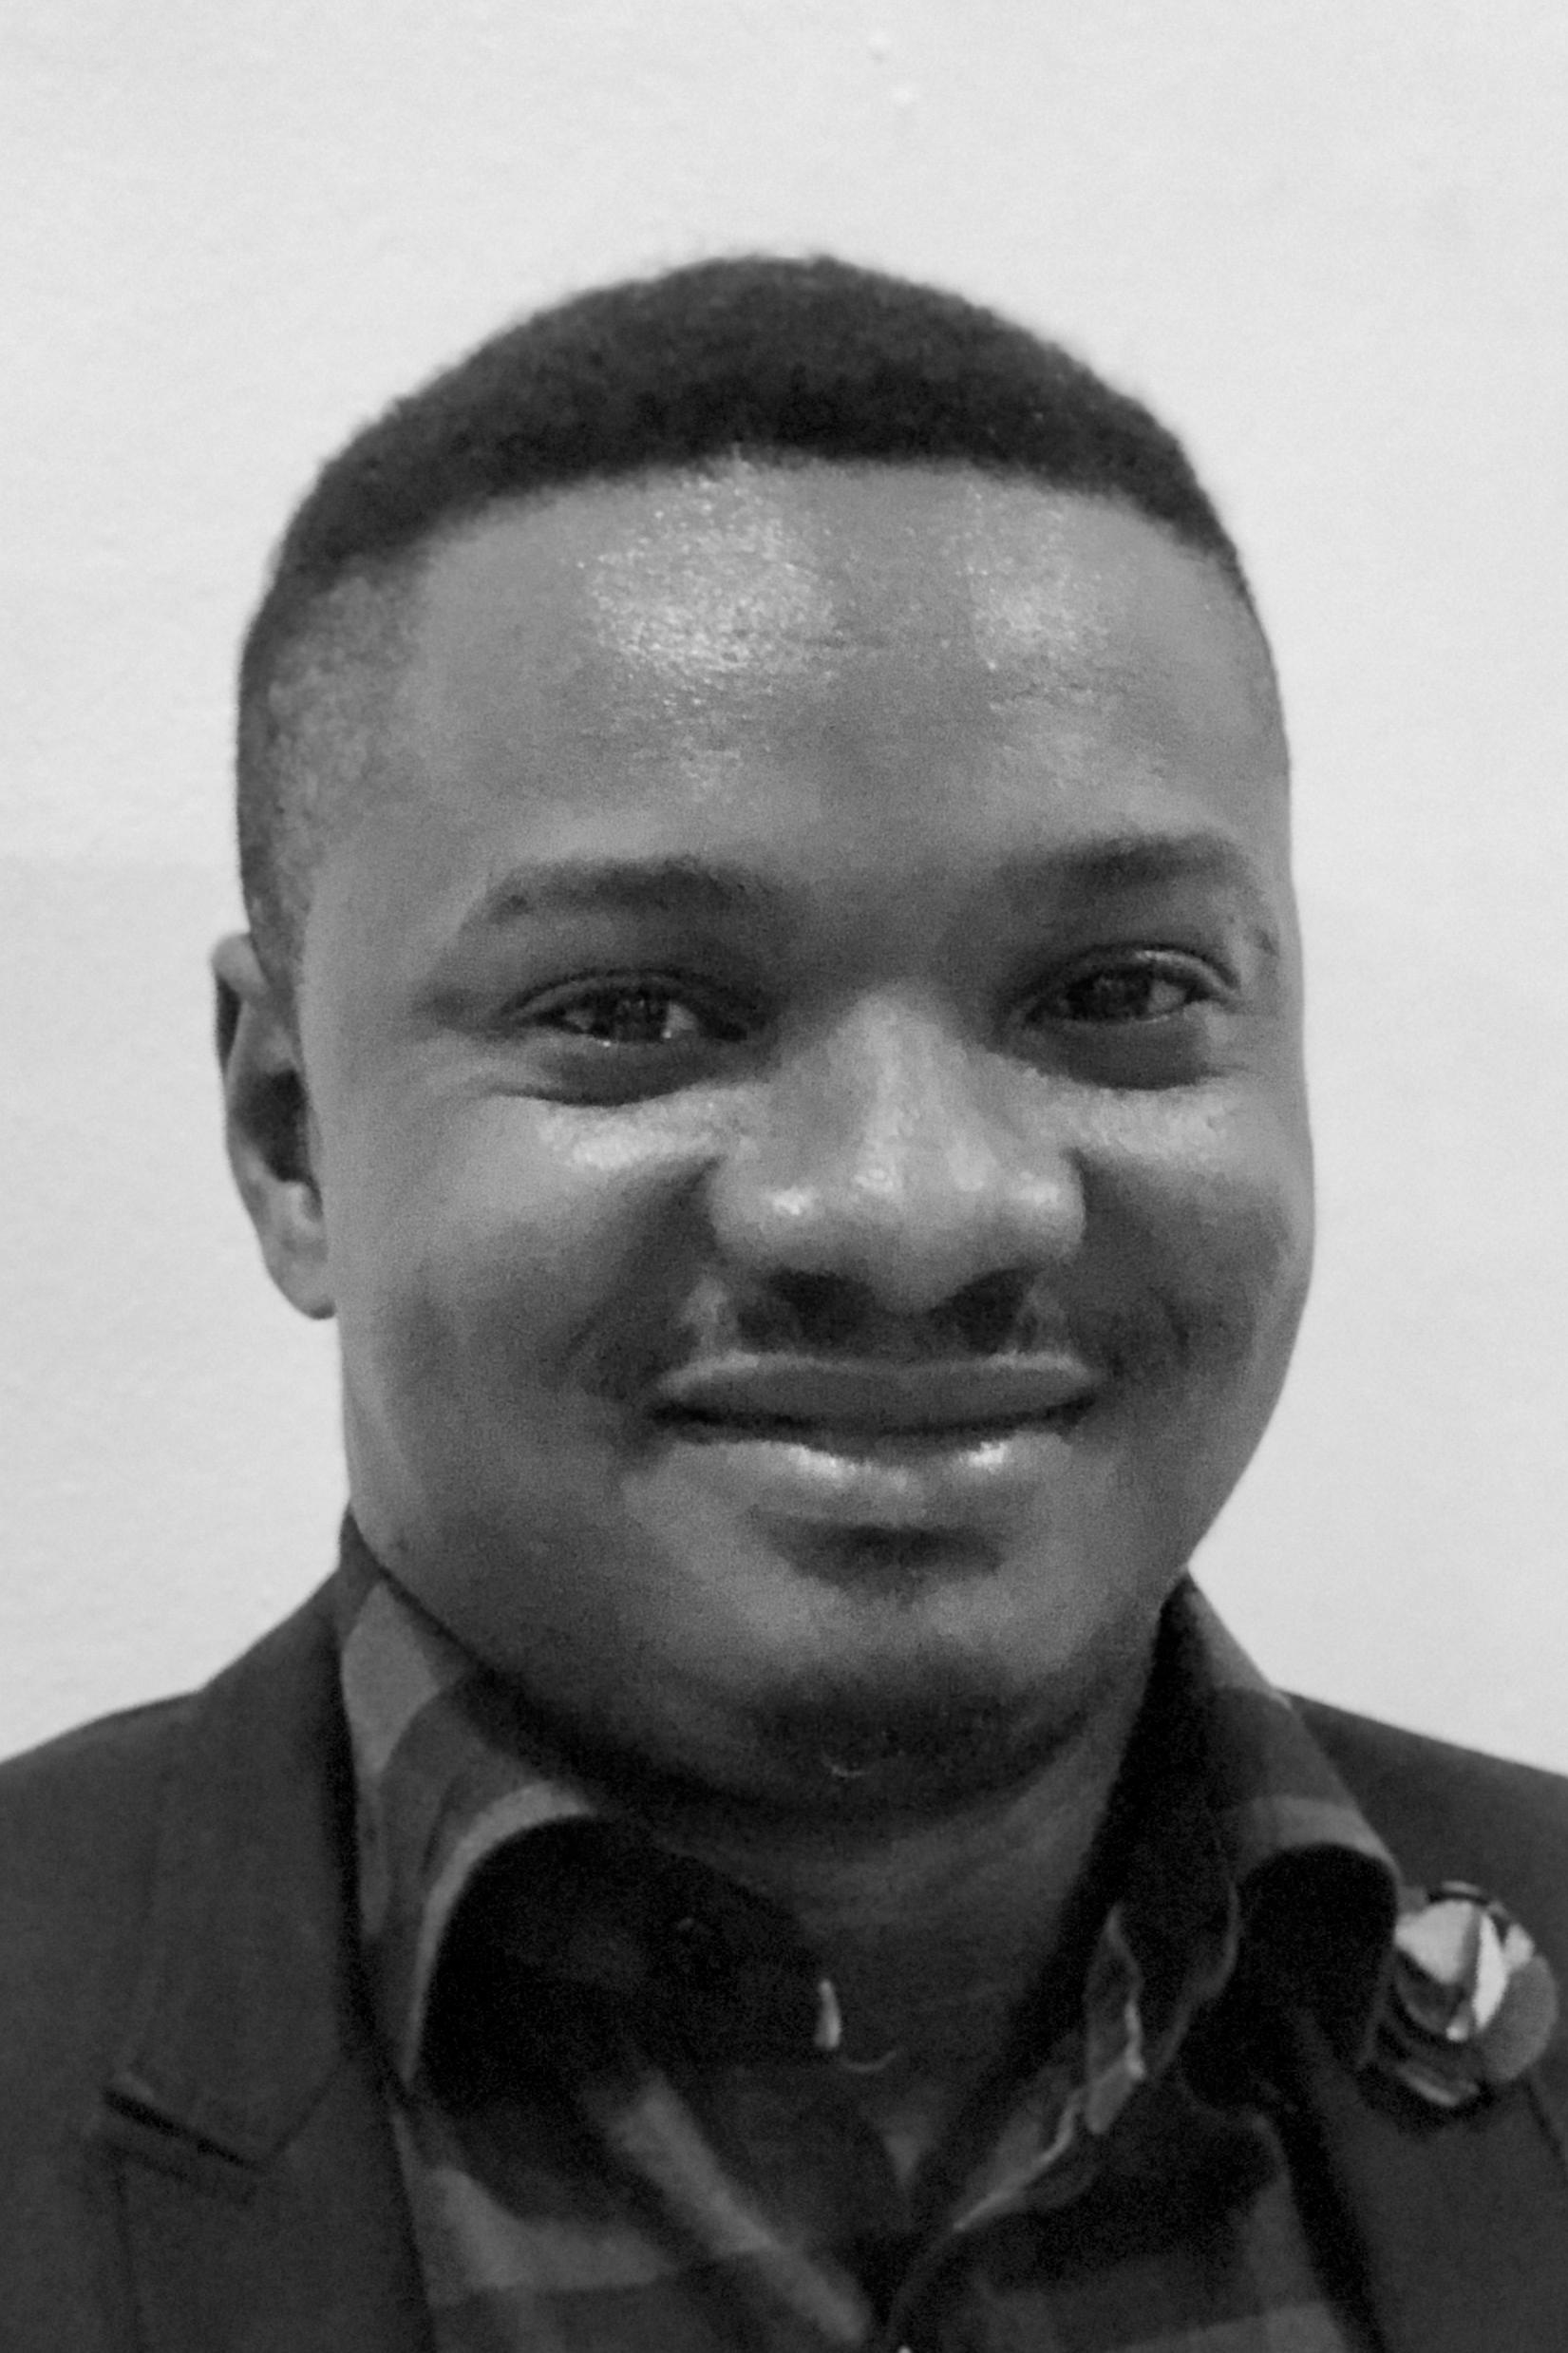 ISAAC UTOMWEN  REGIONAL SECURITY ADVISOR-SPEARFISH WEST AFRICA